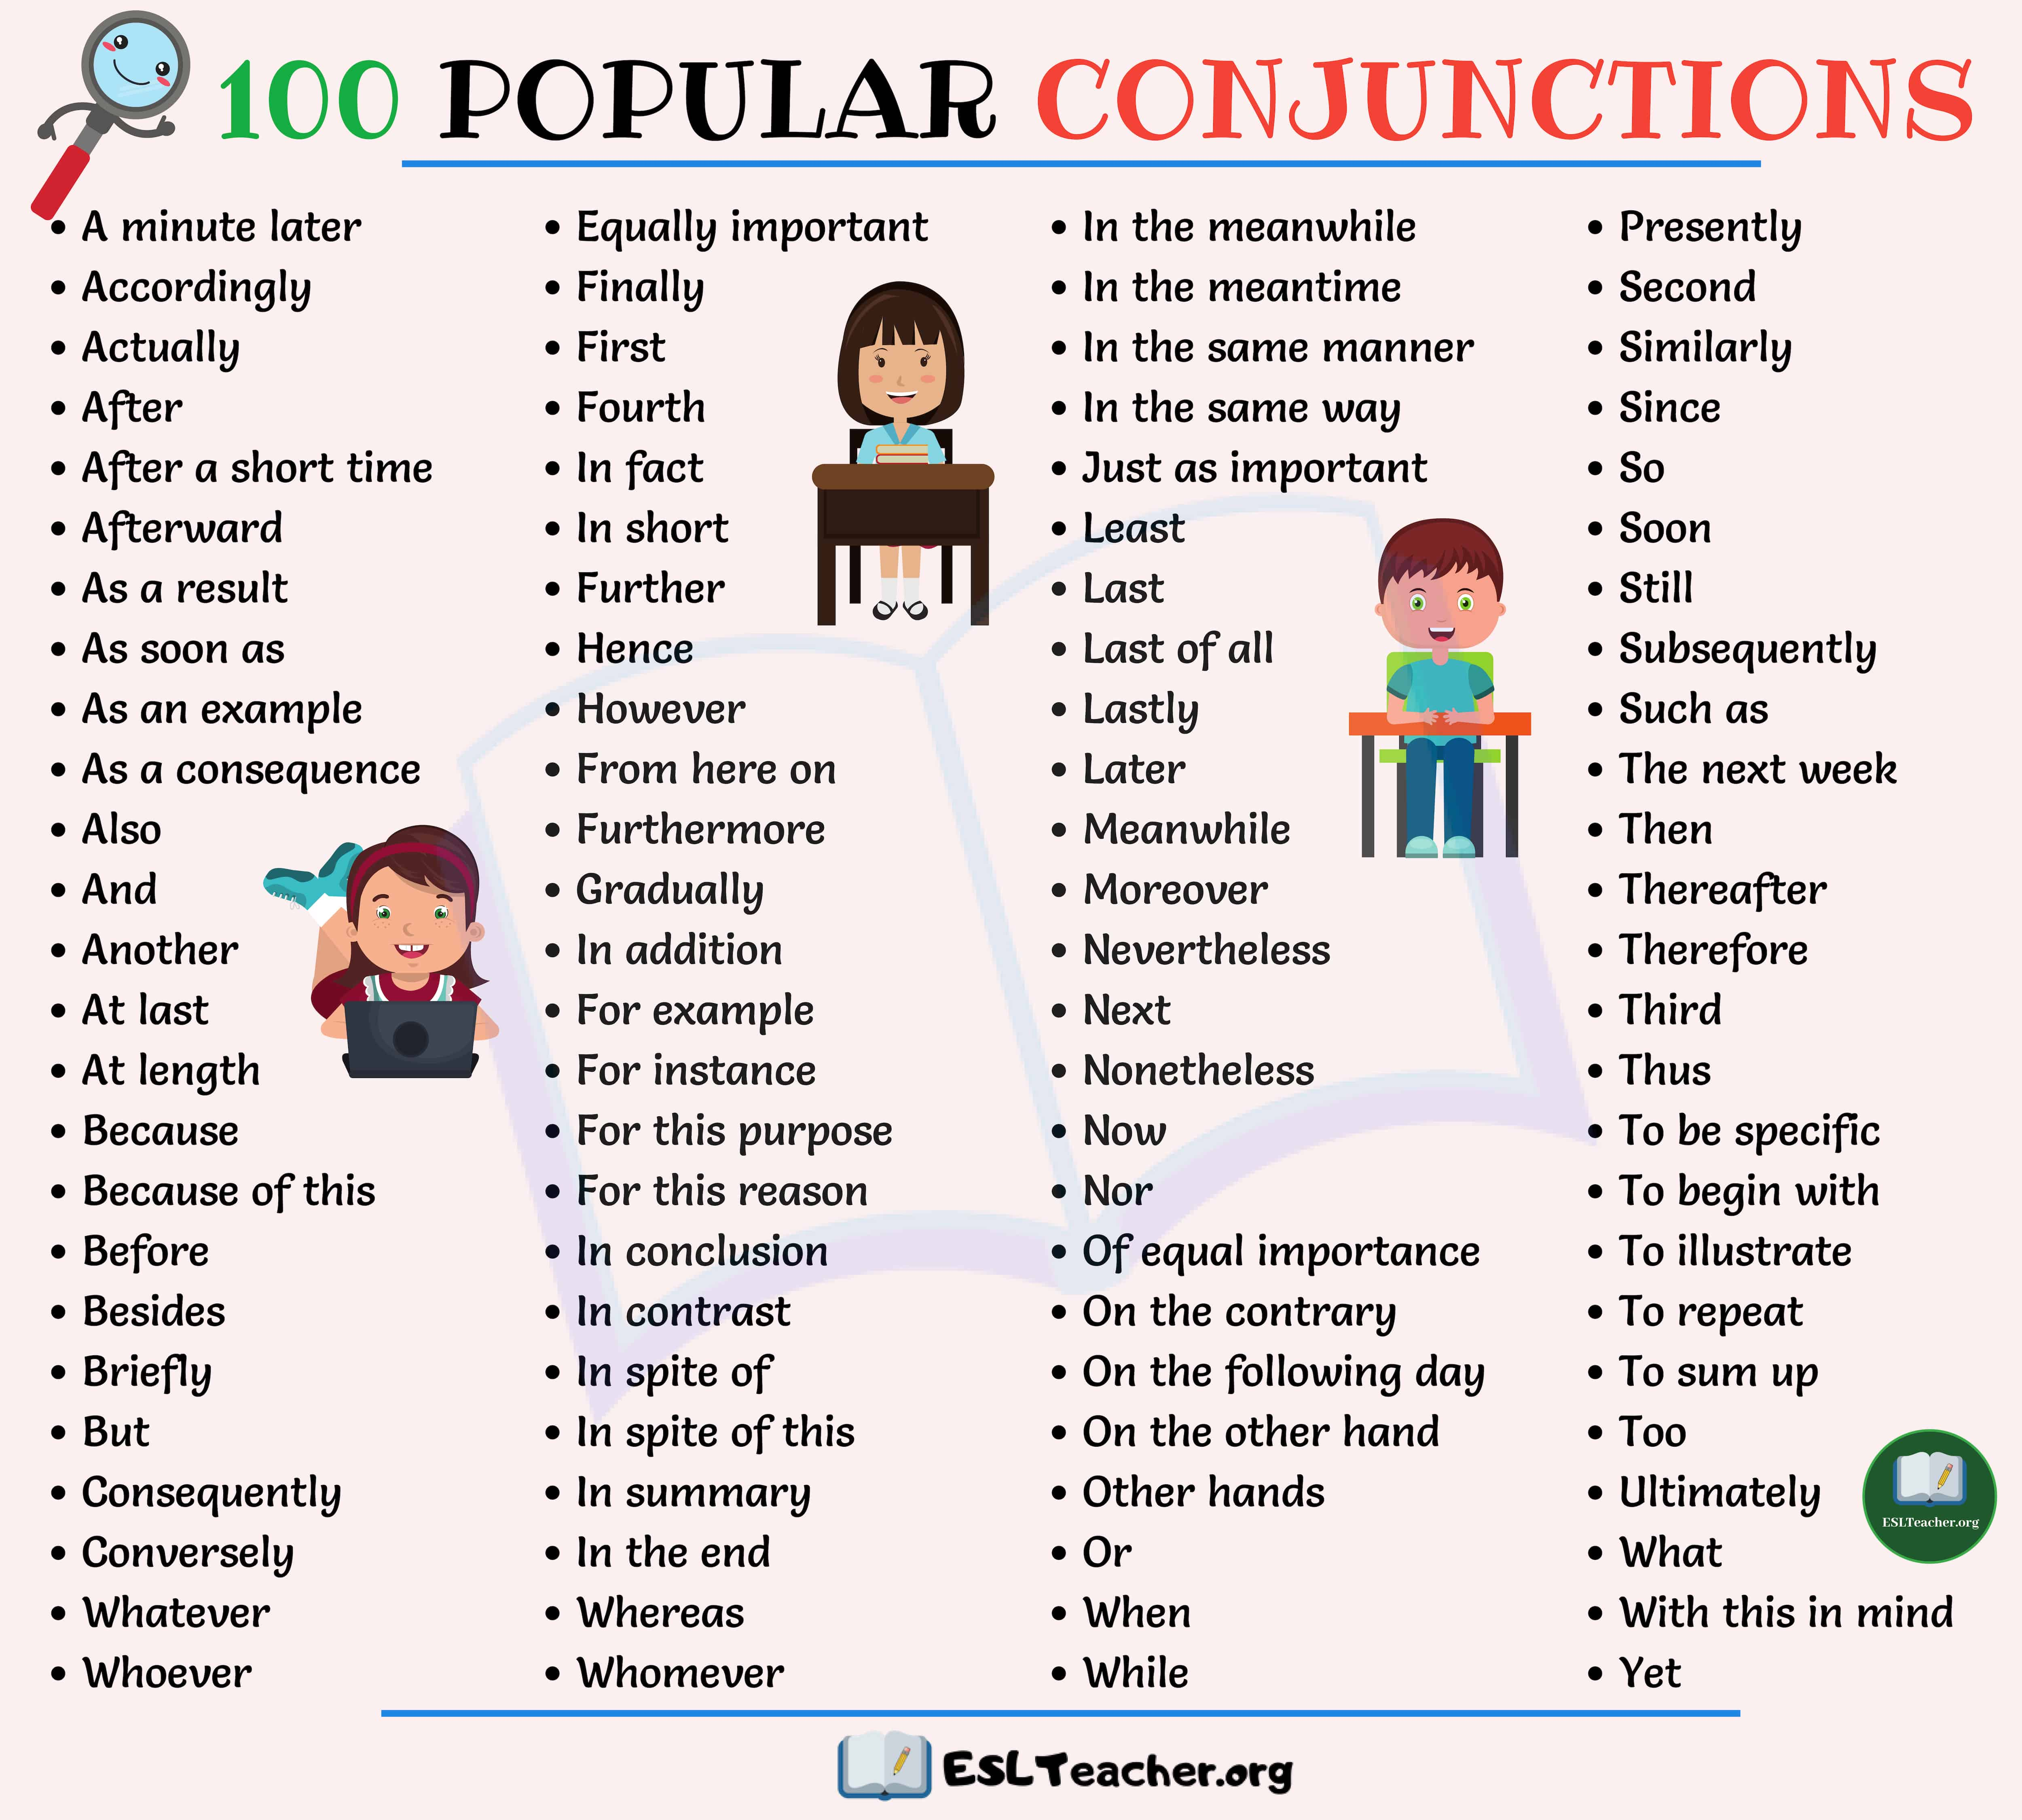 Conjunctions List Top 100 Popular Conjunctions In